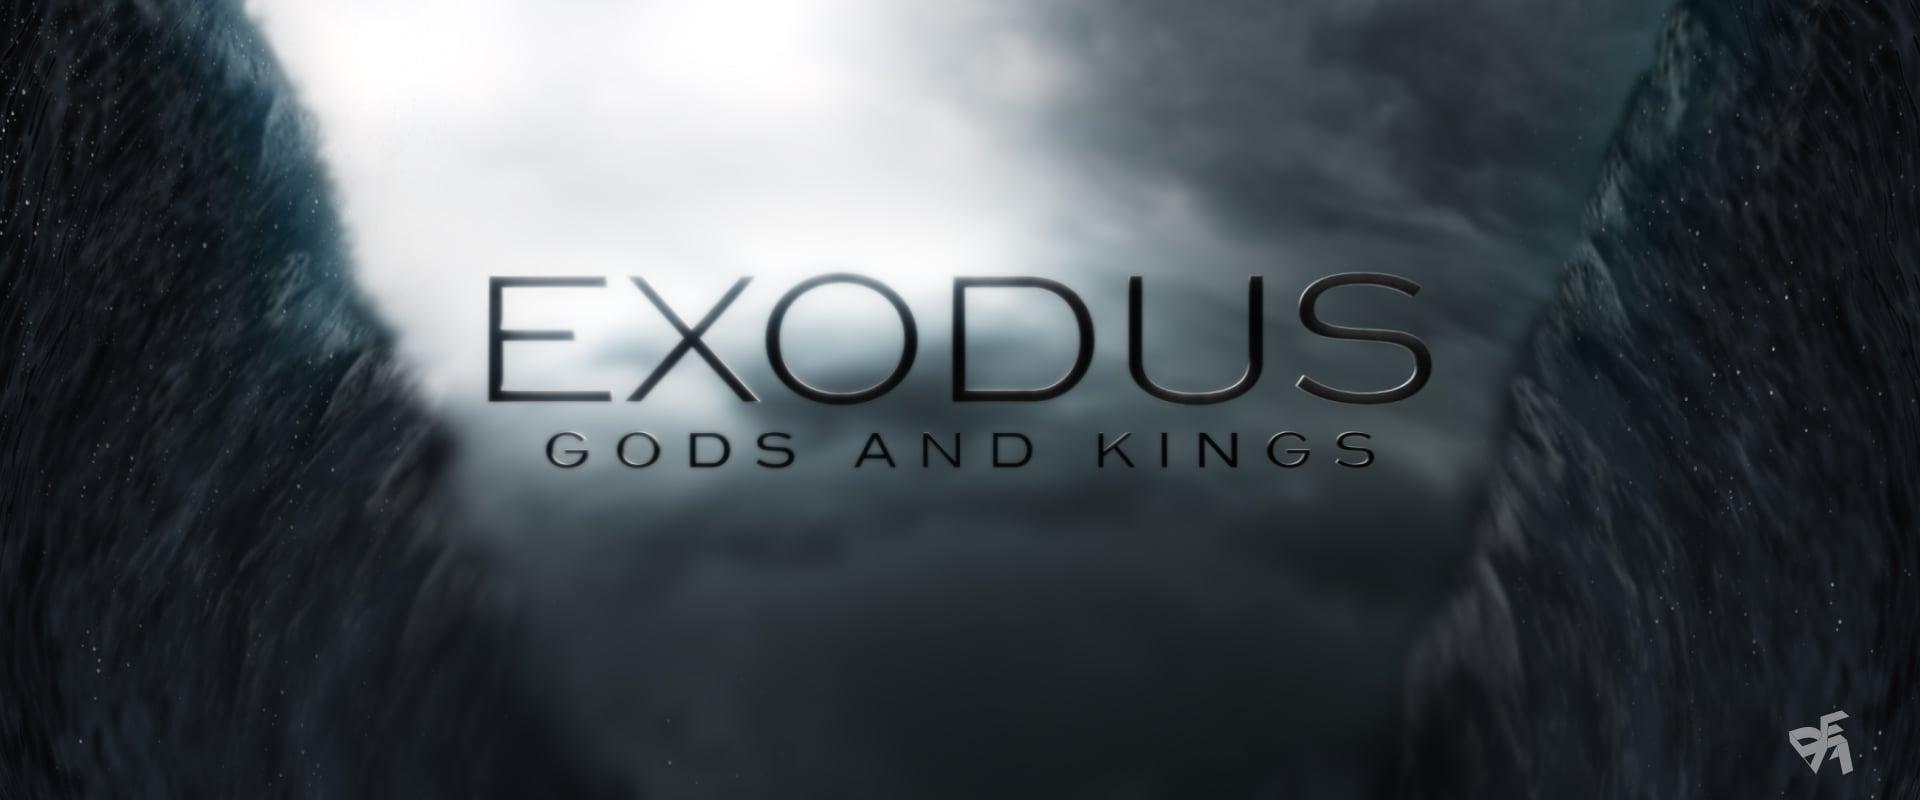 Exodus-STYLEFRAME_09.jpg